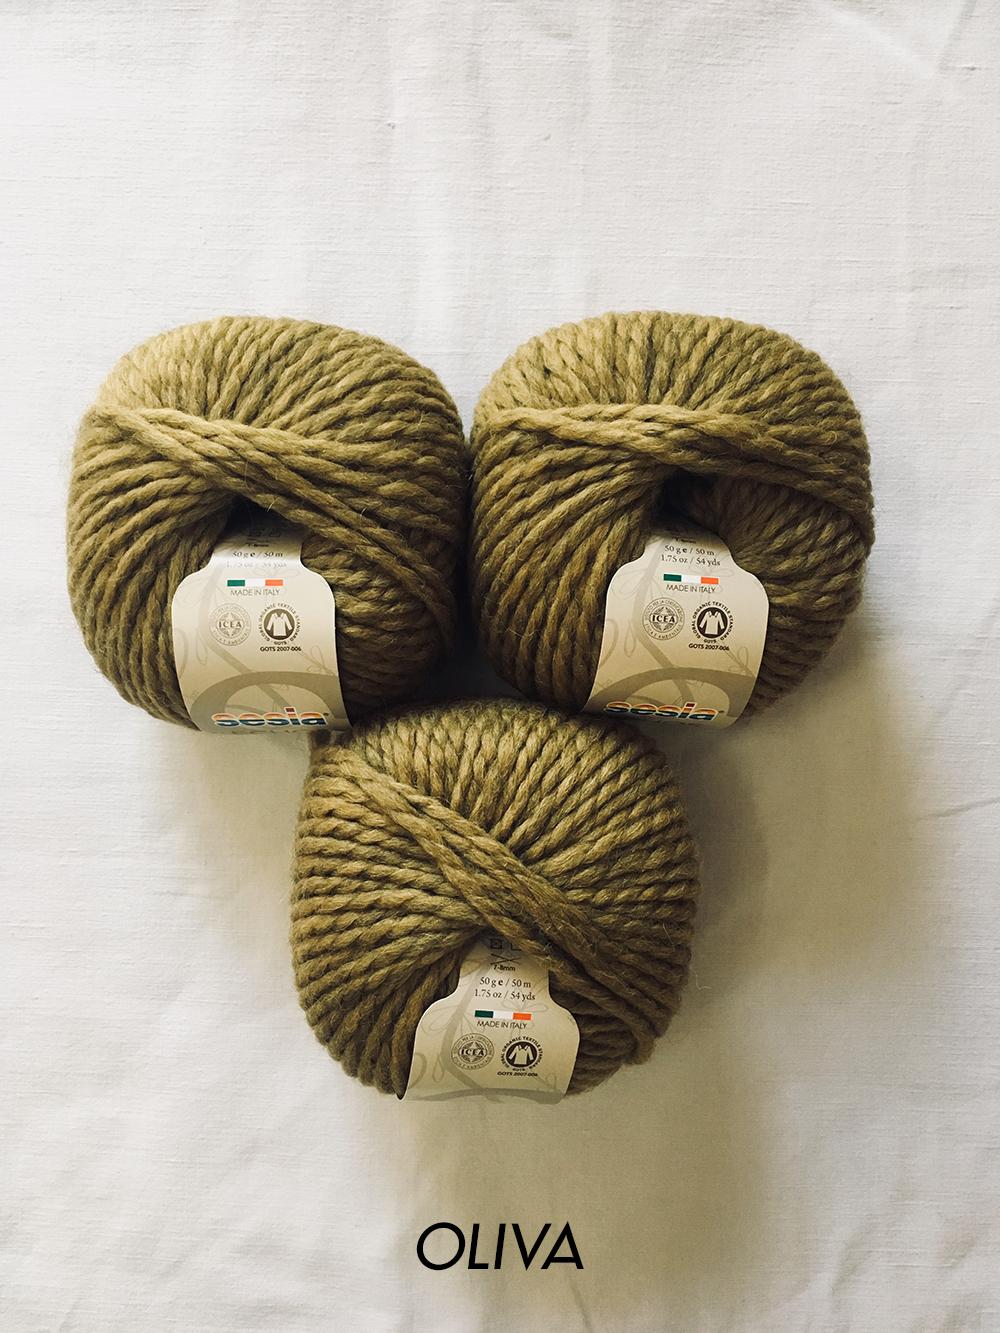 sesia_echos_oliva_493_wool_done_knitting.jpg